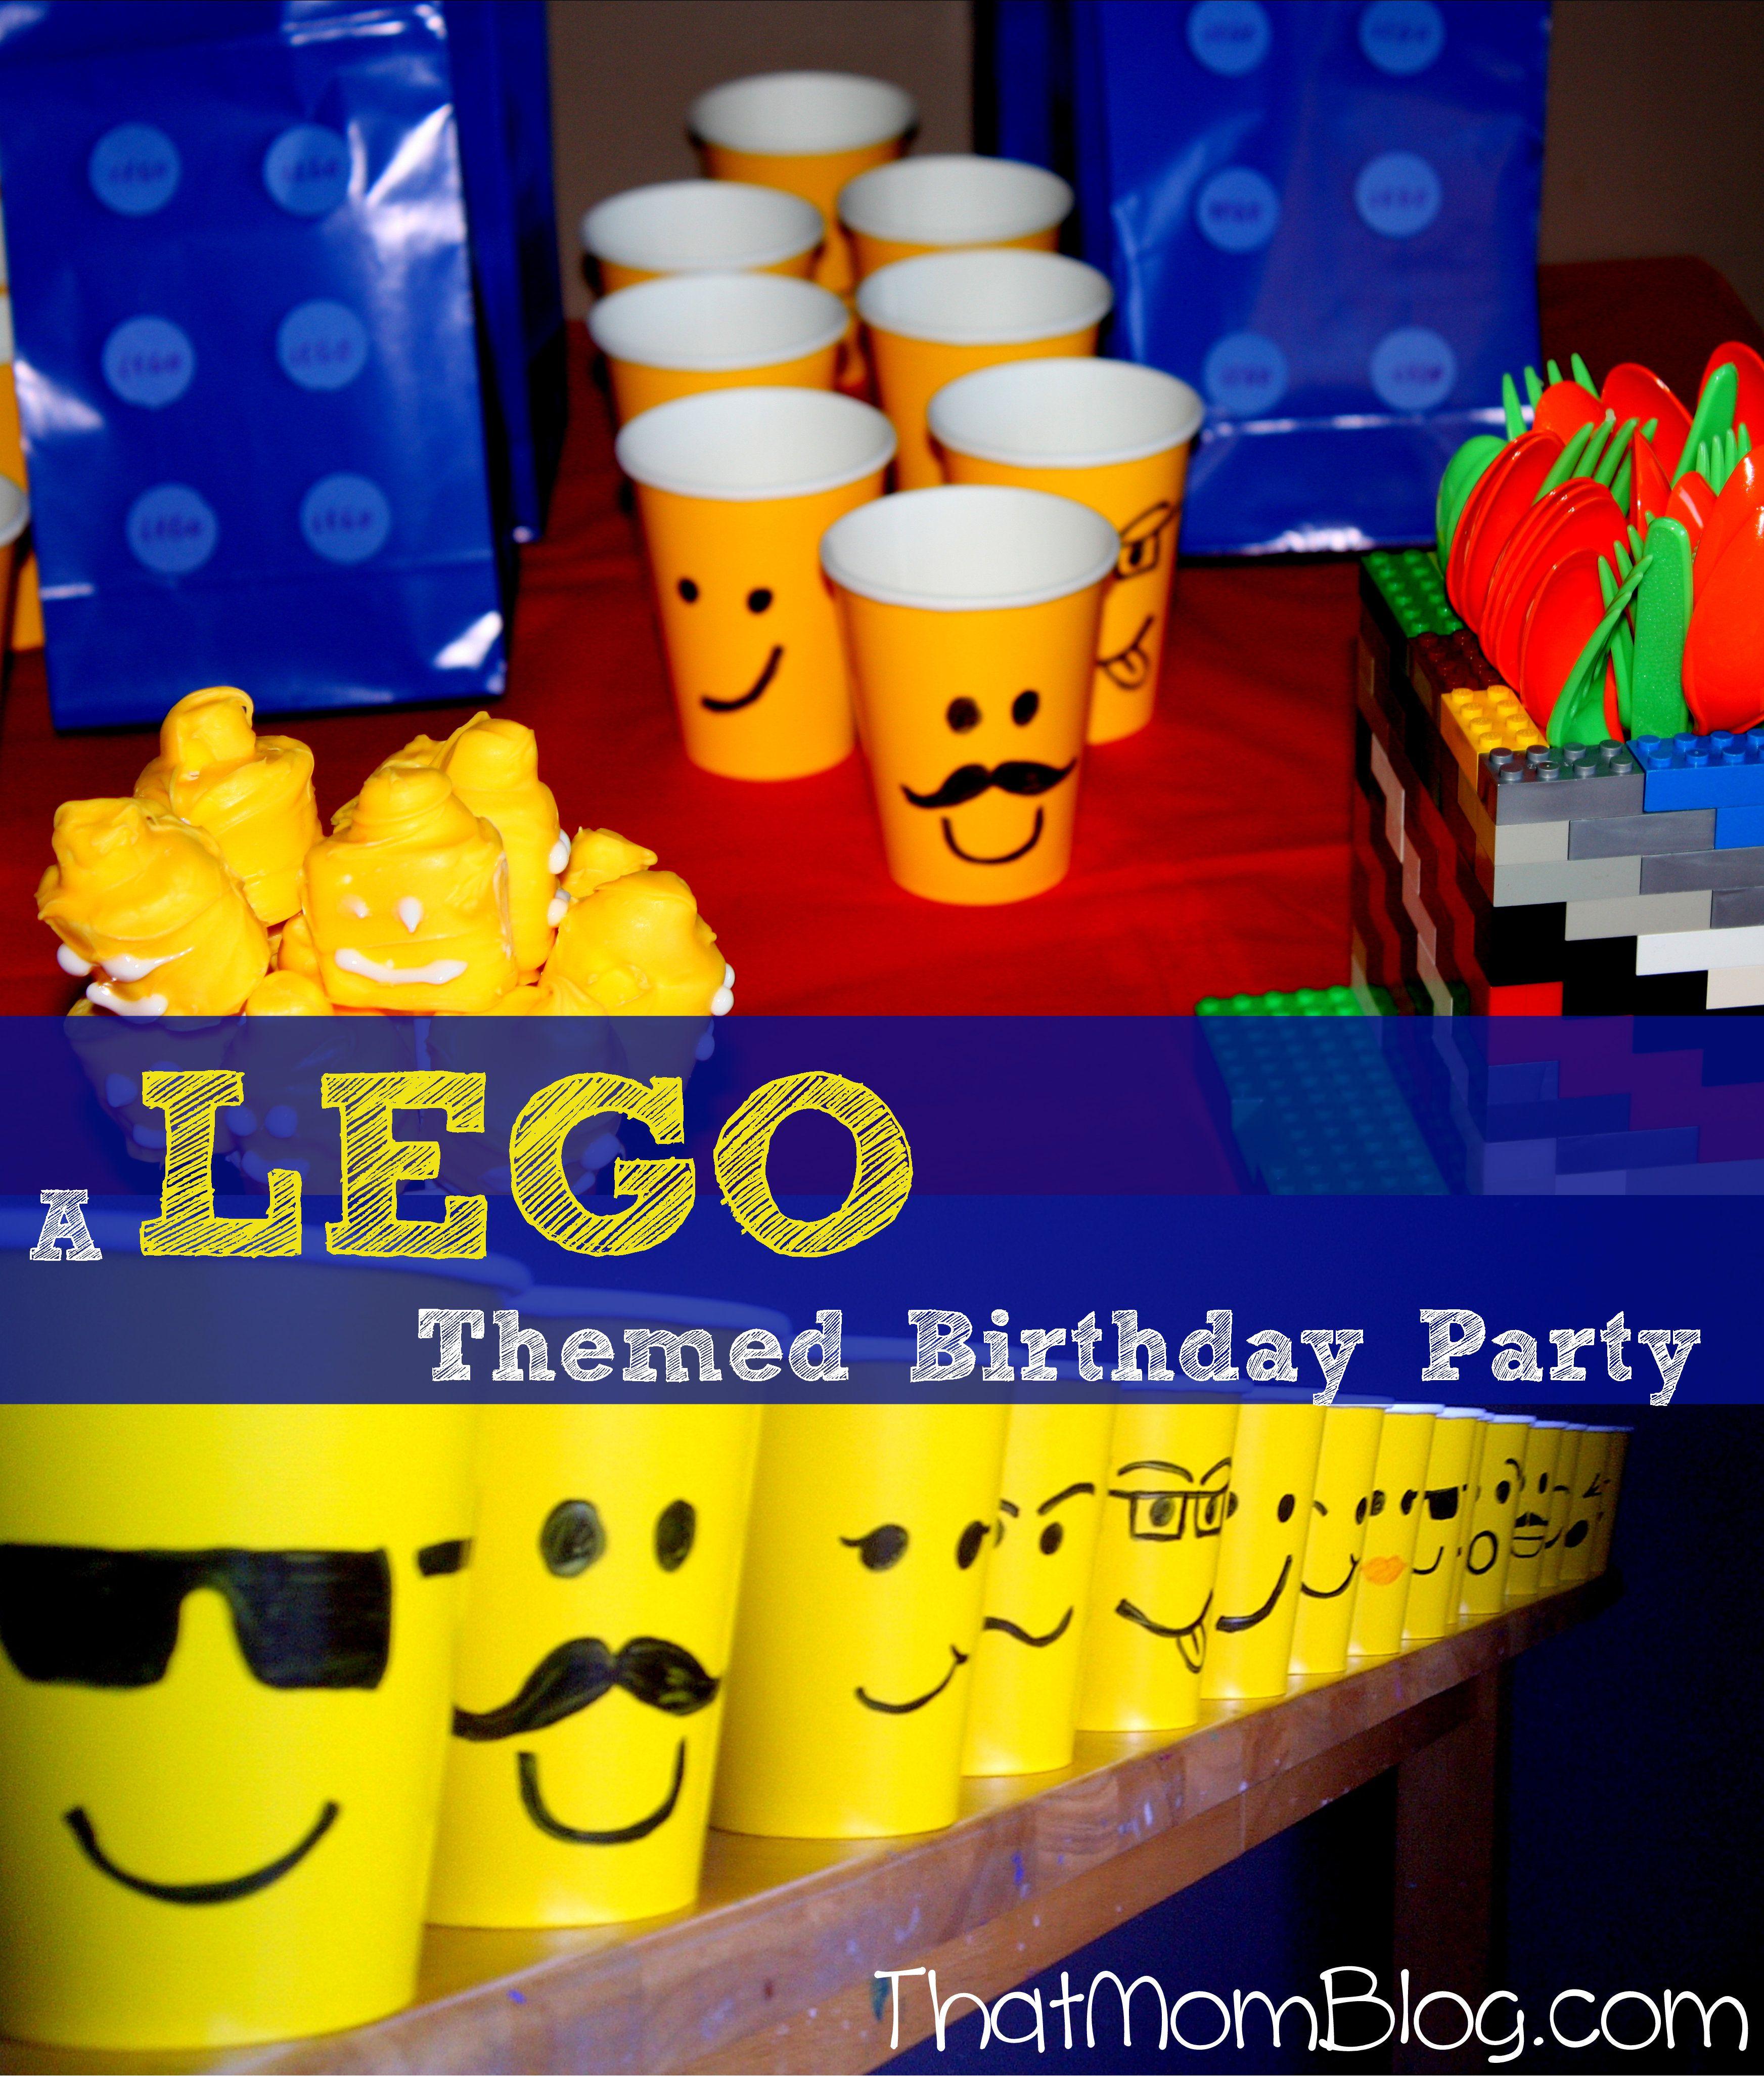 Lego Ninjago Birthday Party Google Search: Lego Birthday Party - Google Search